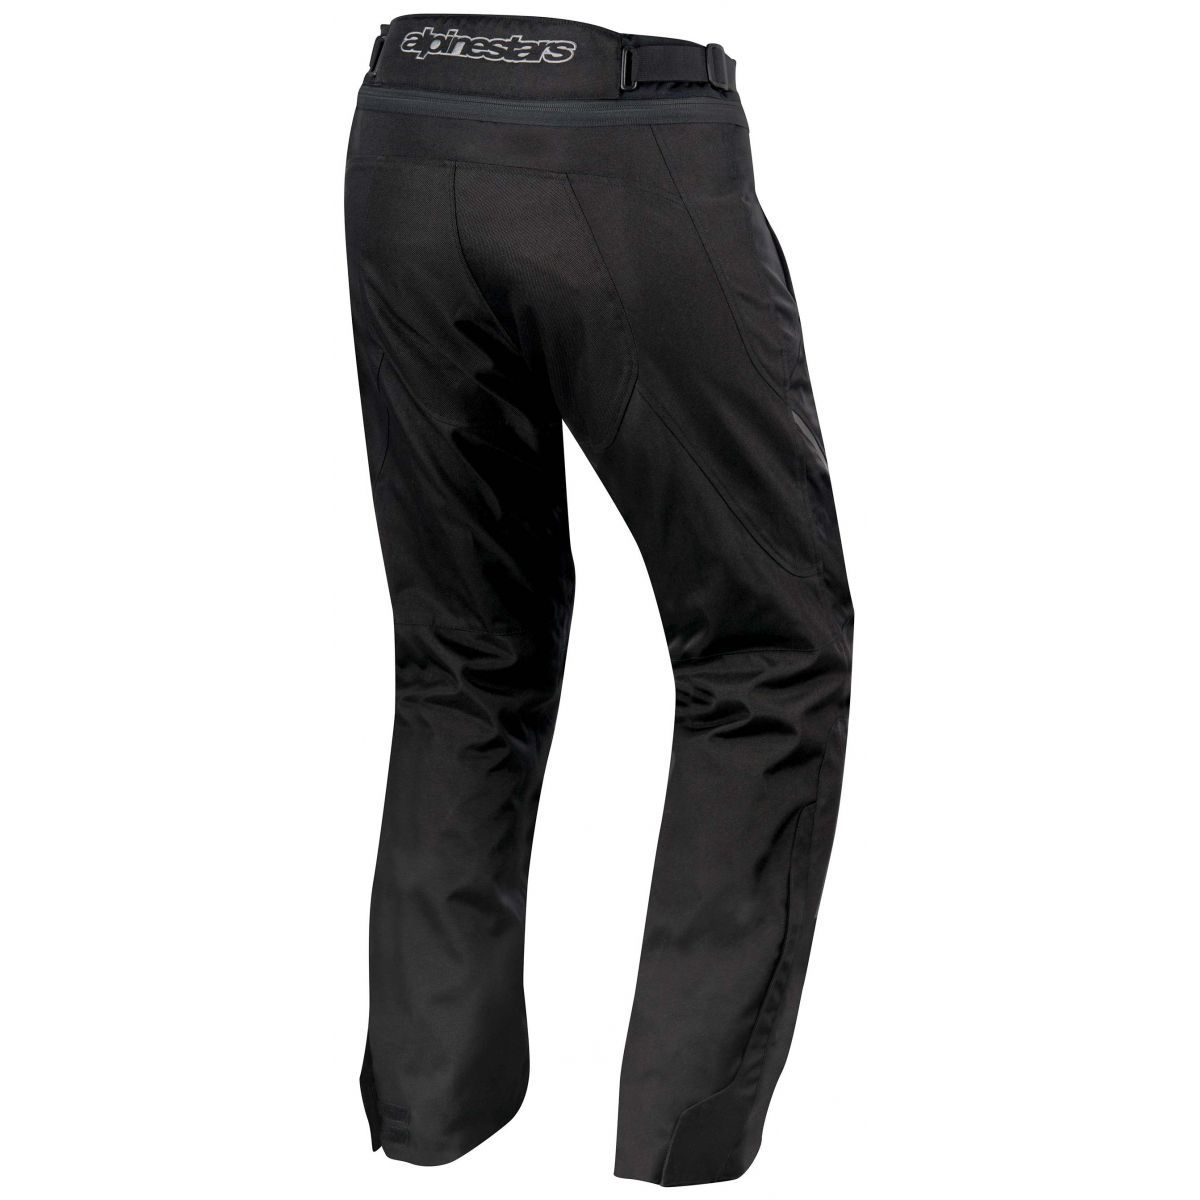 Calça Alpinestars AST-1 WP (Black)  - Nova Suzuki Motos e Acessórios